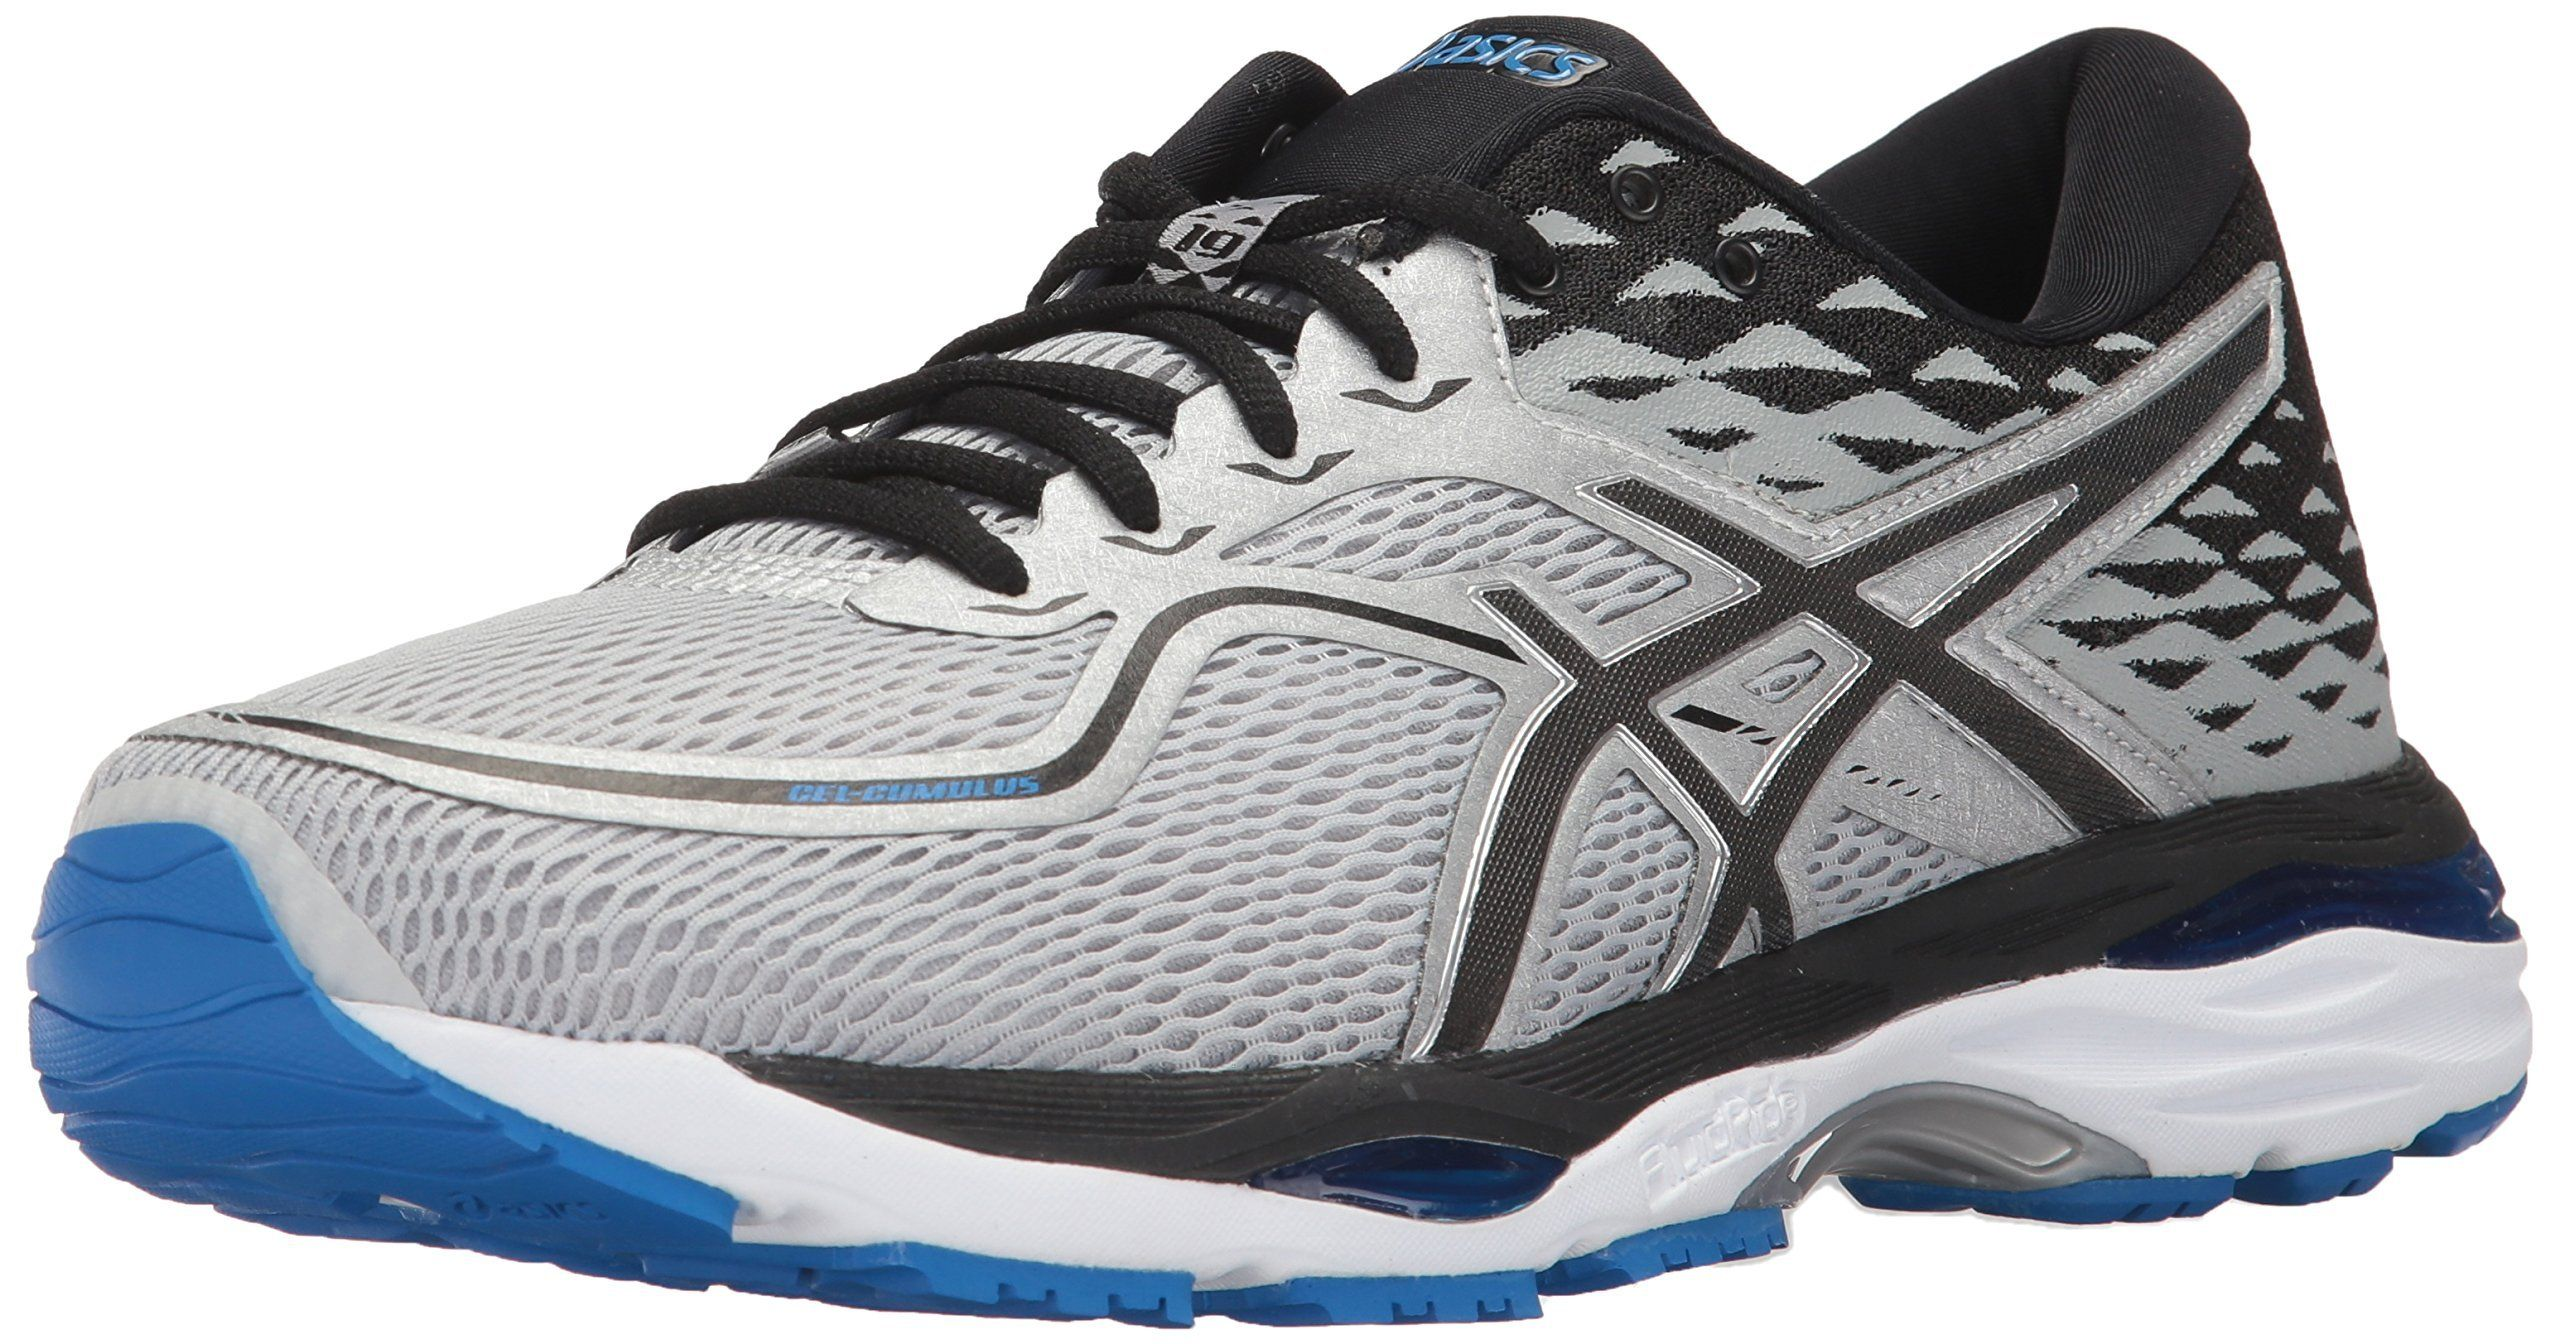 Asics Mens Gel Cumulus 19 Running Shoe Lovely Novelty Casual Running Shoes Running Shoes For Men Running Shoe Reviews